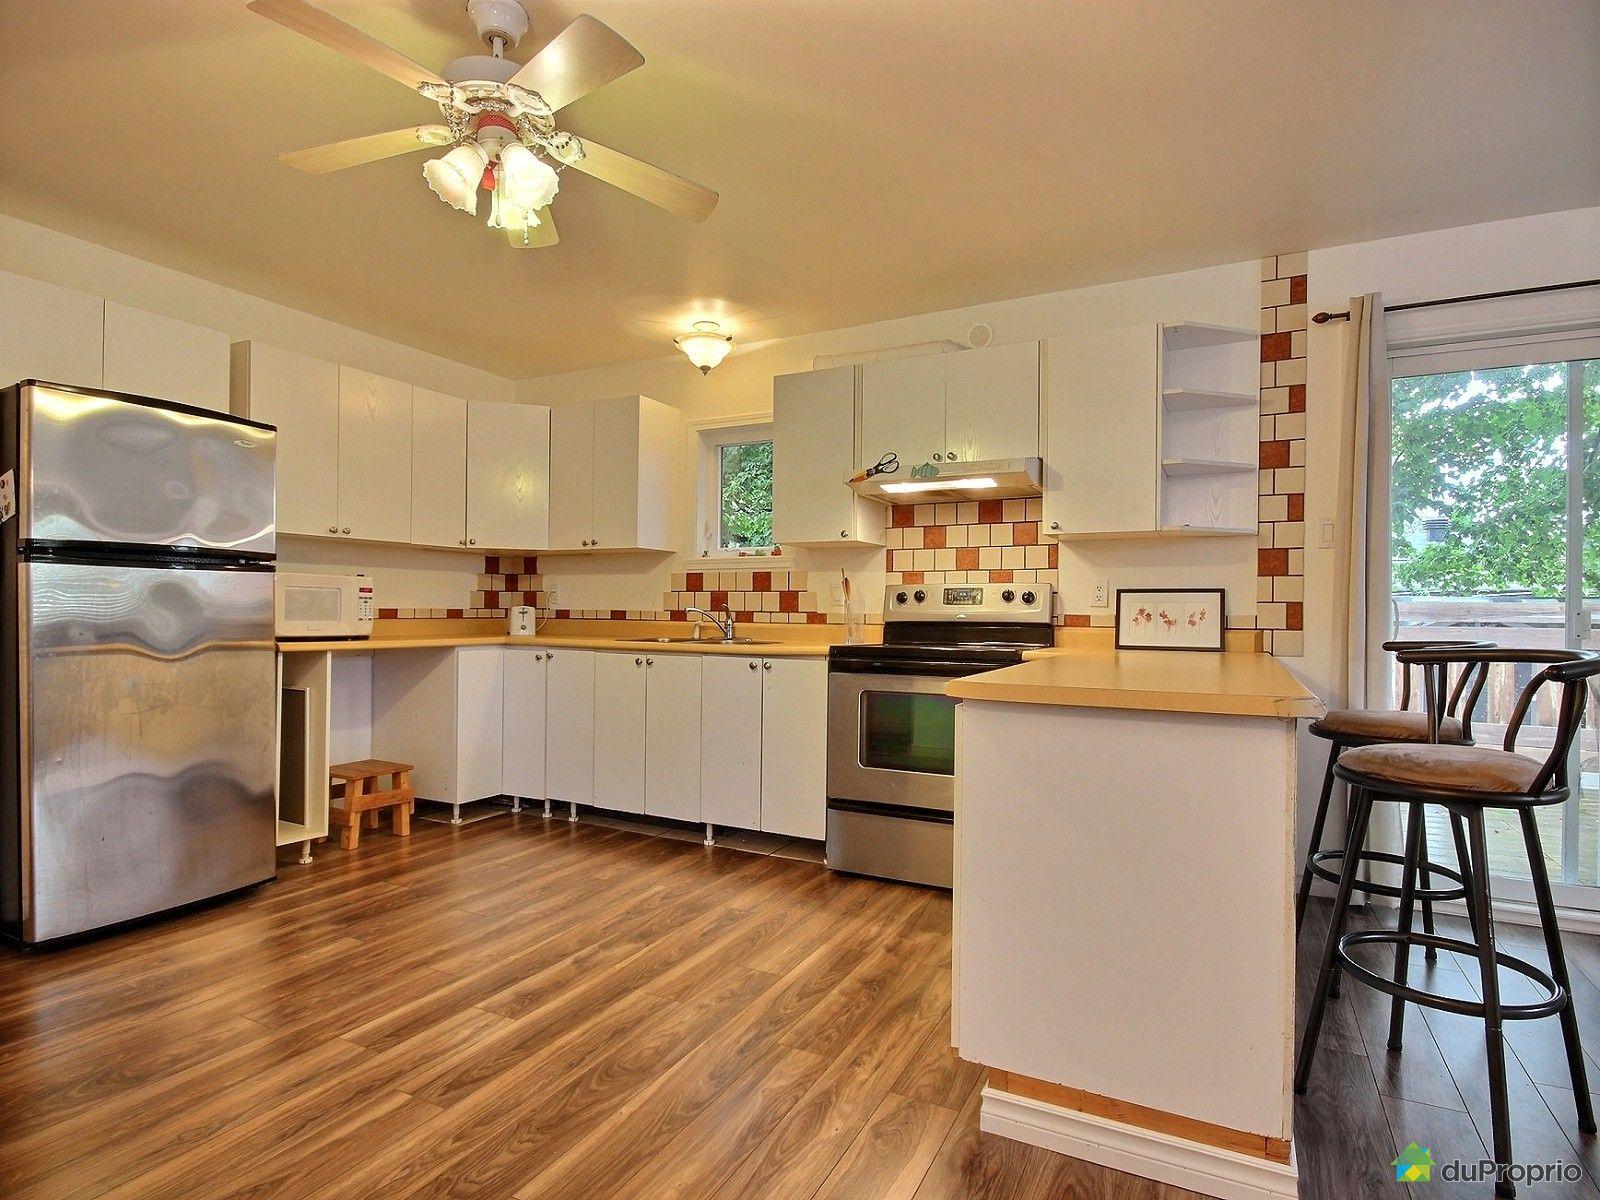 maison vendu st mile immobilier qu bec duproprio 645434. Black Bedroom Furniture Sets. Home Design Ideas